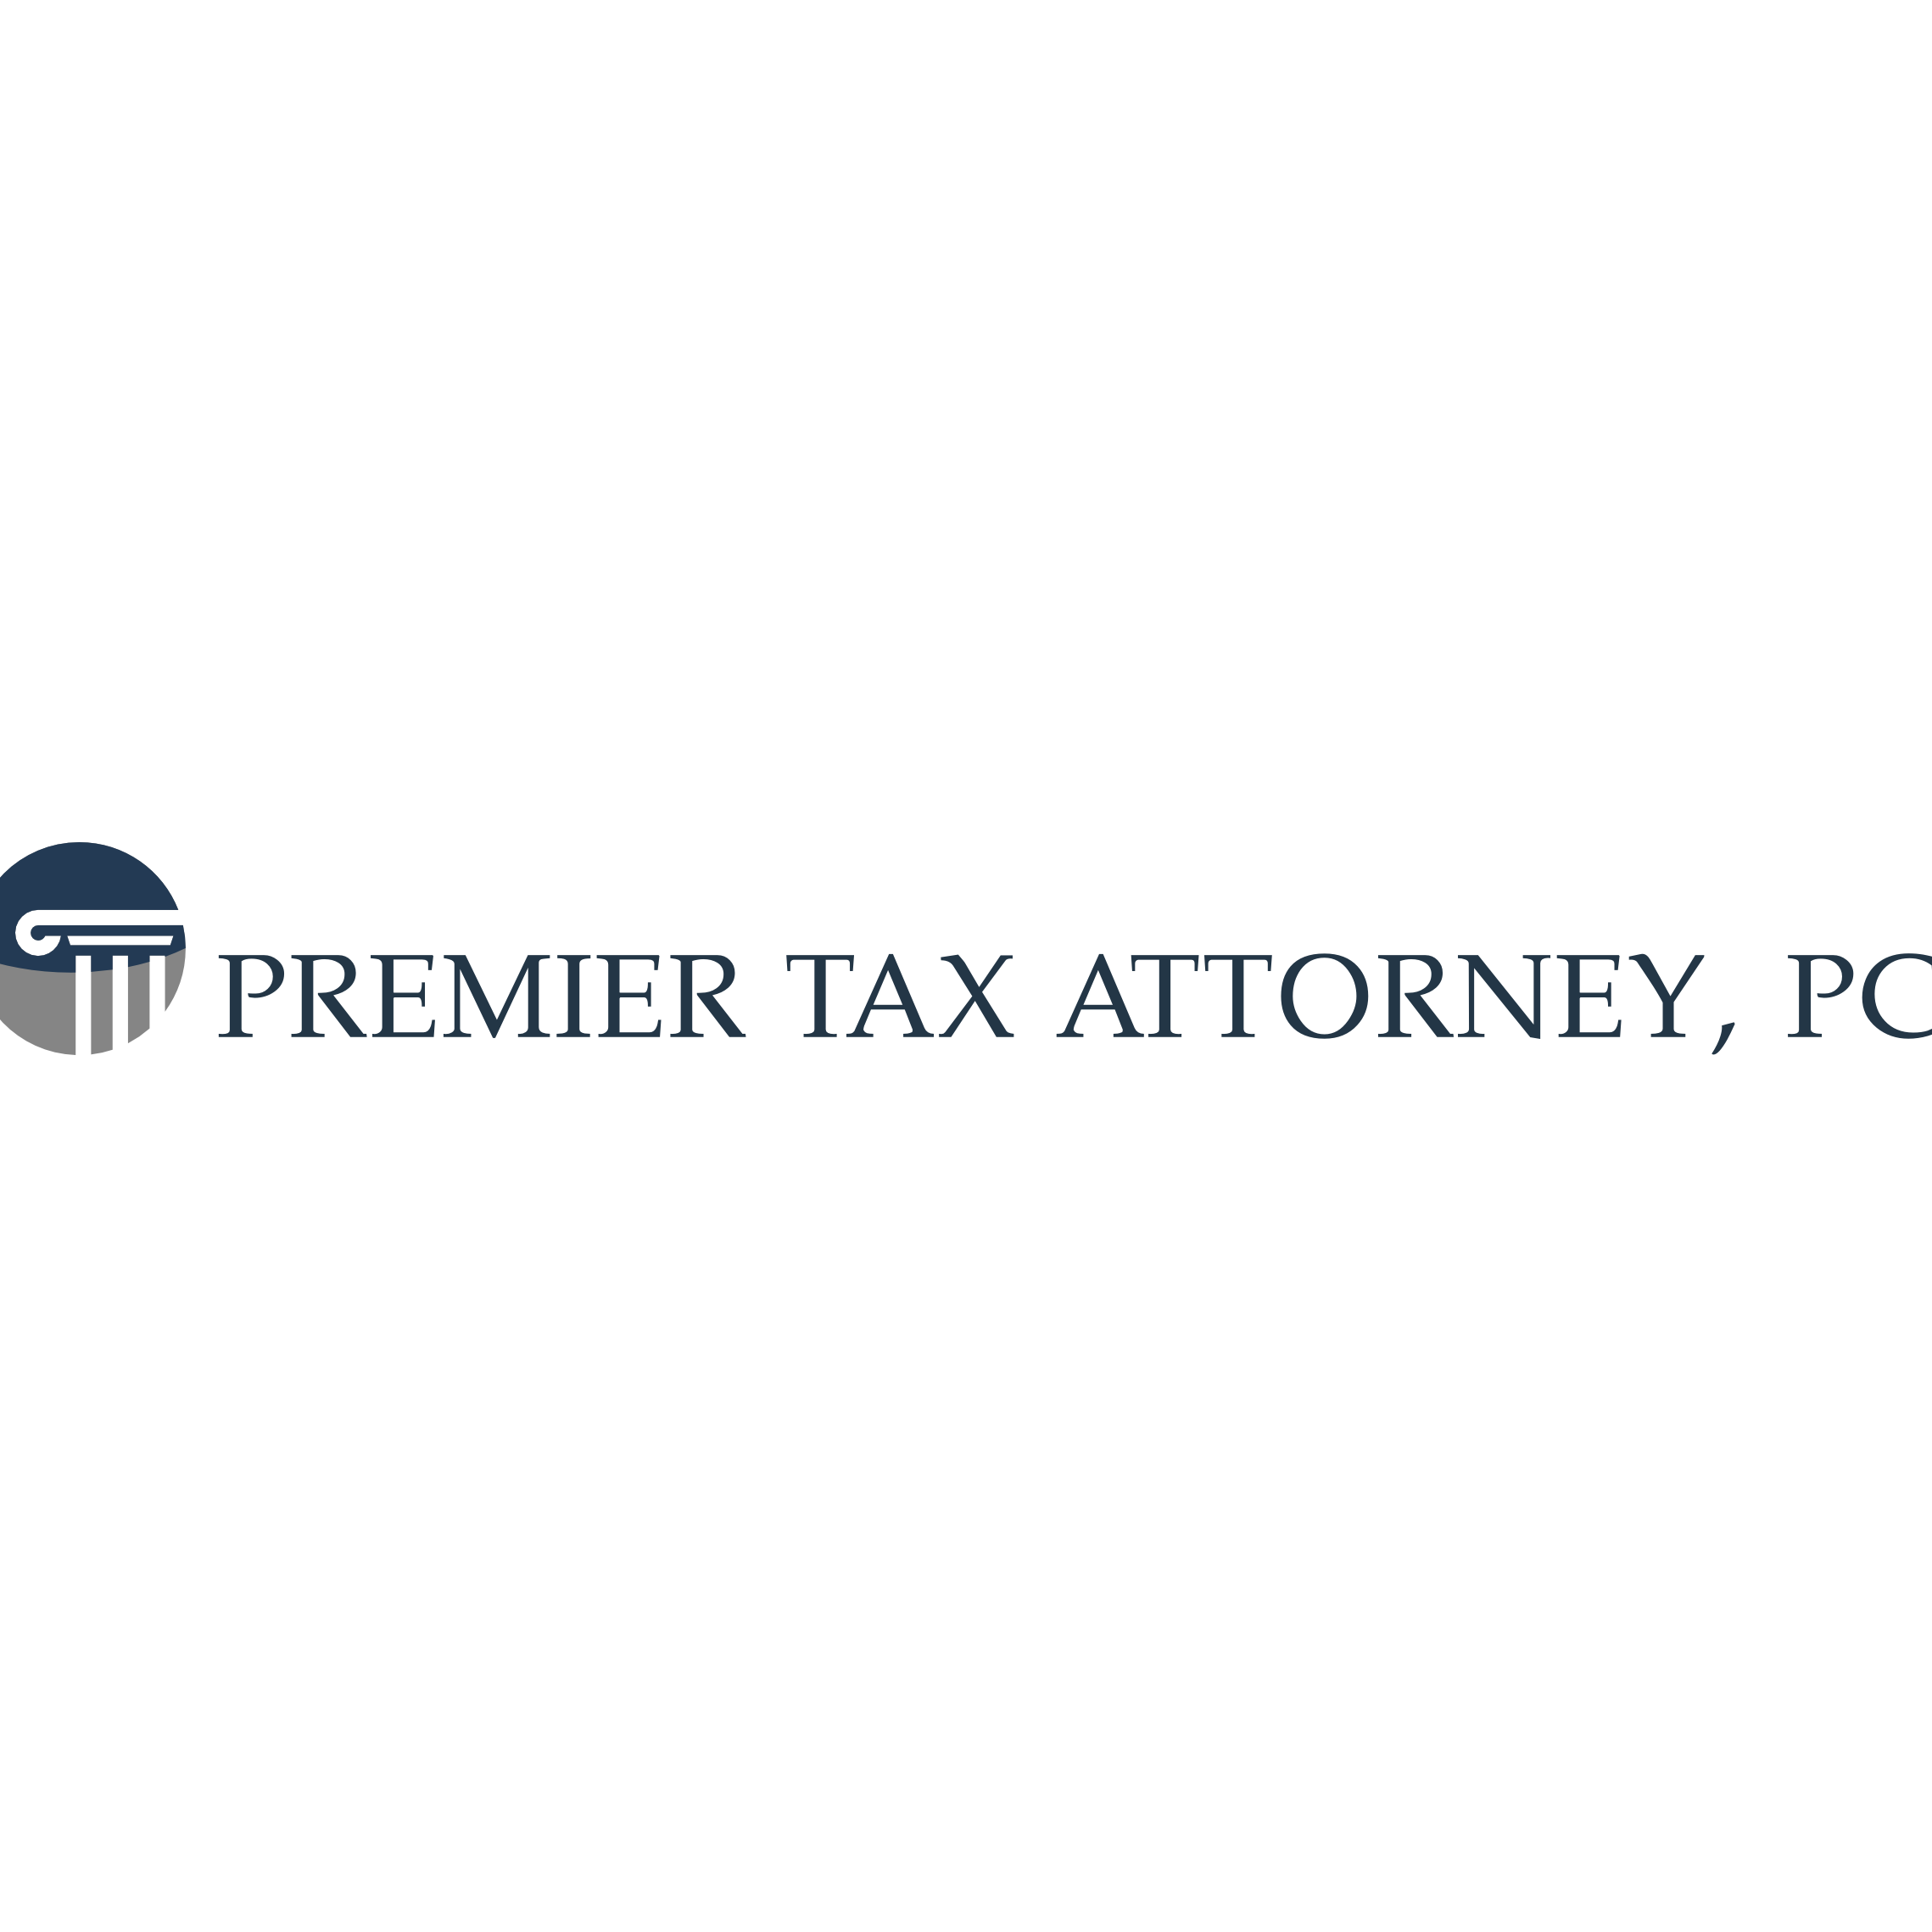 Premier Tax Attorney, PC